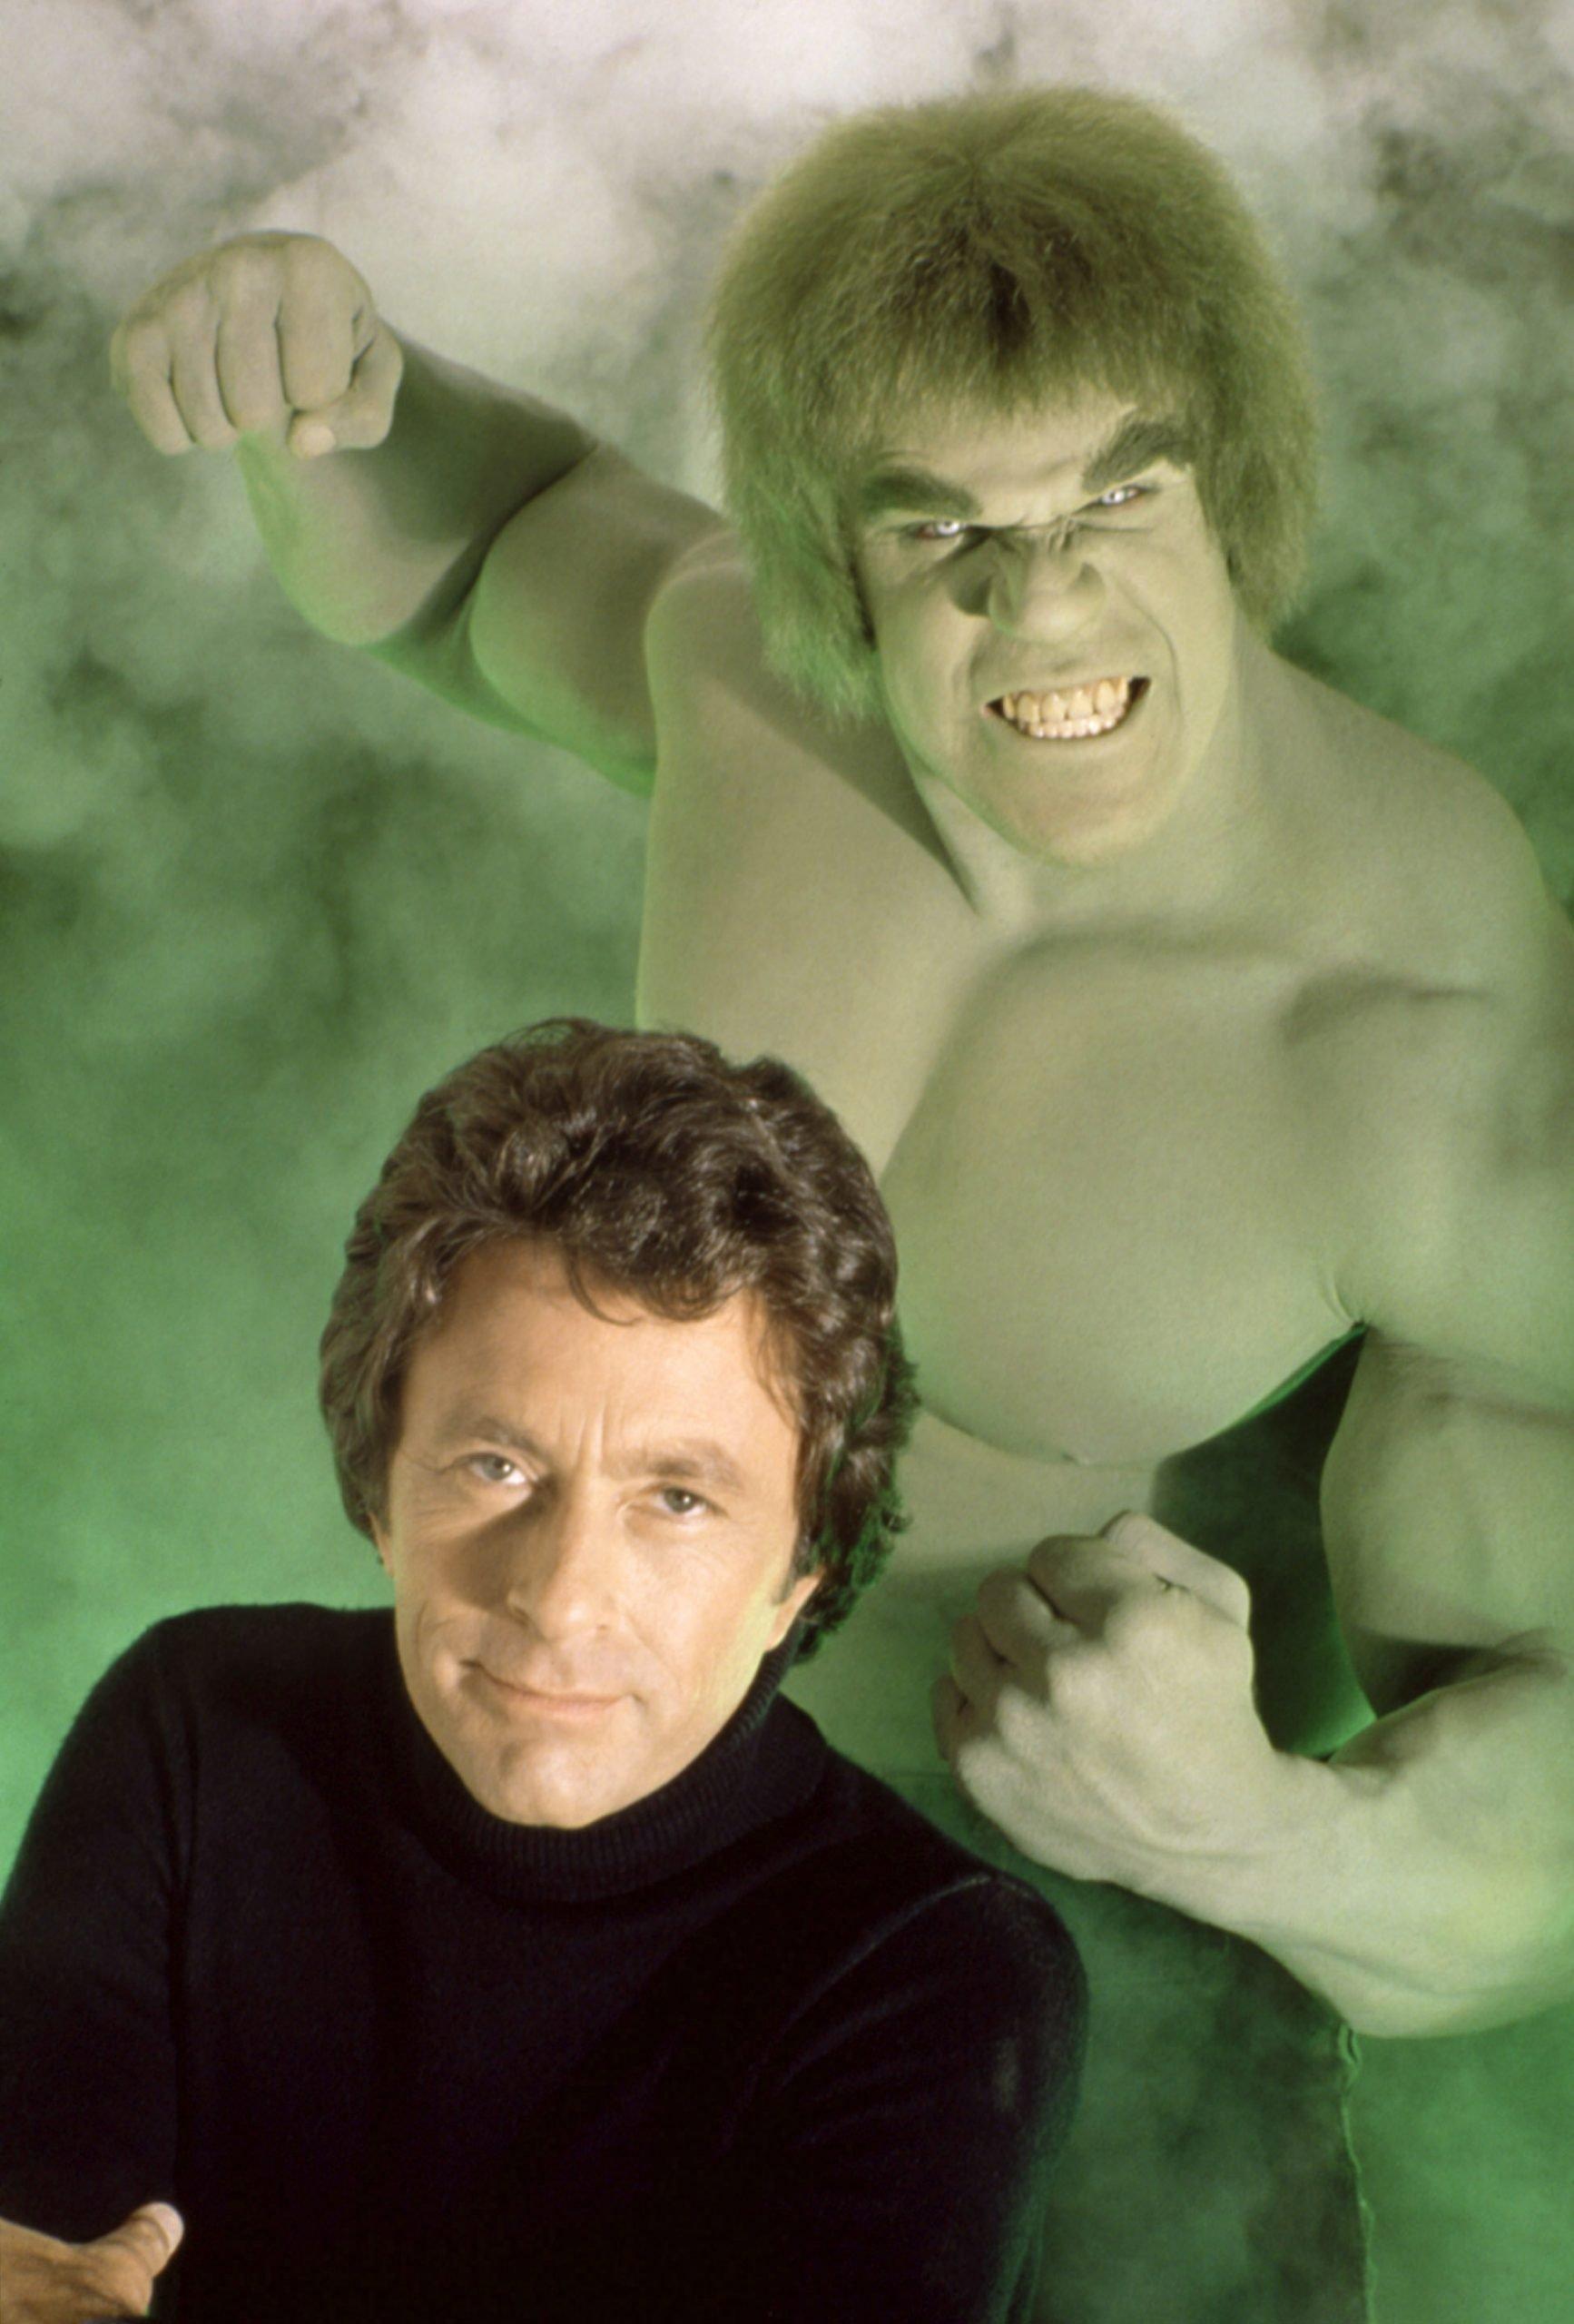 bill-bixby-lou-ferrigno-the-incredible-hulk